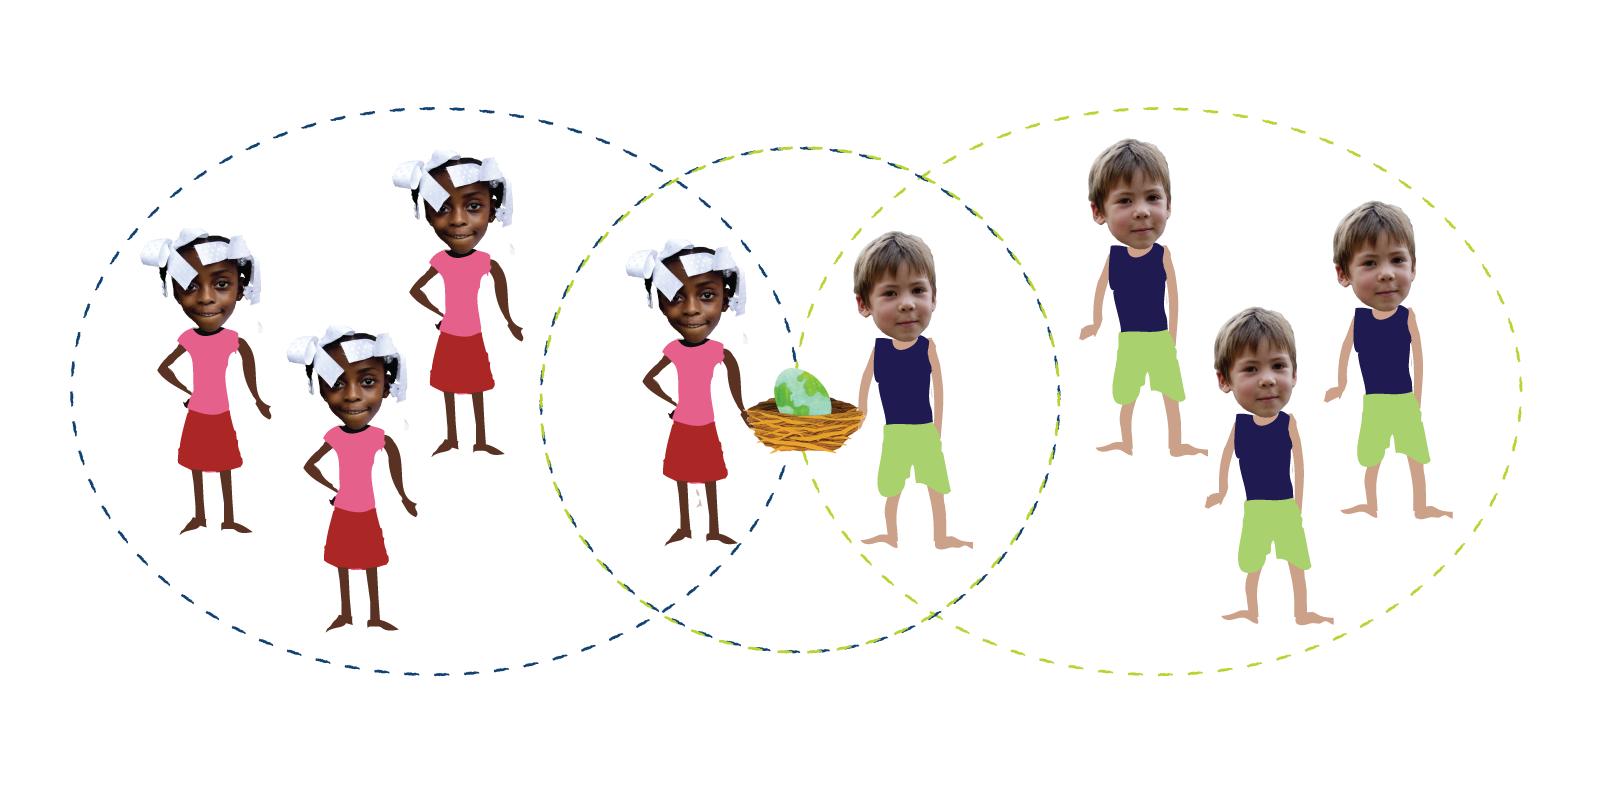 Intergroup bias dovidio study